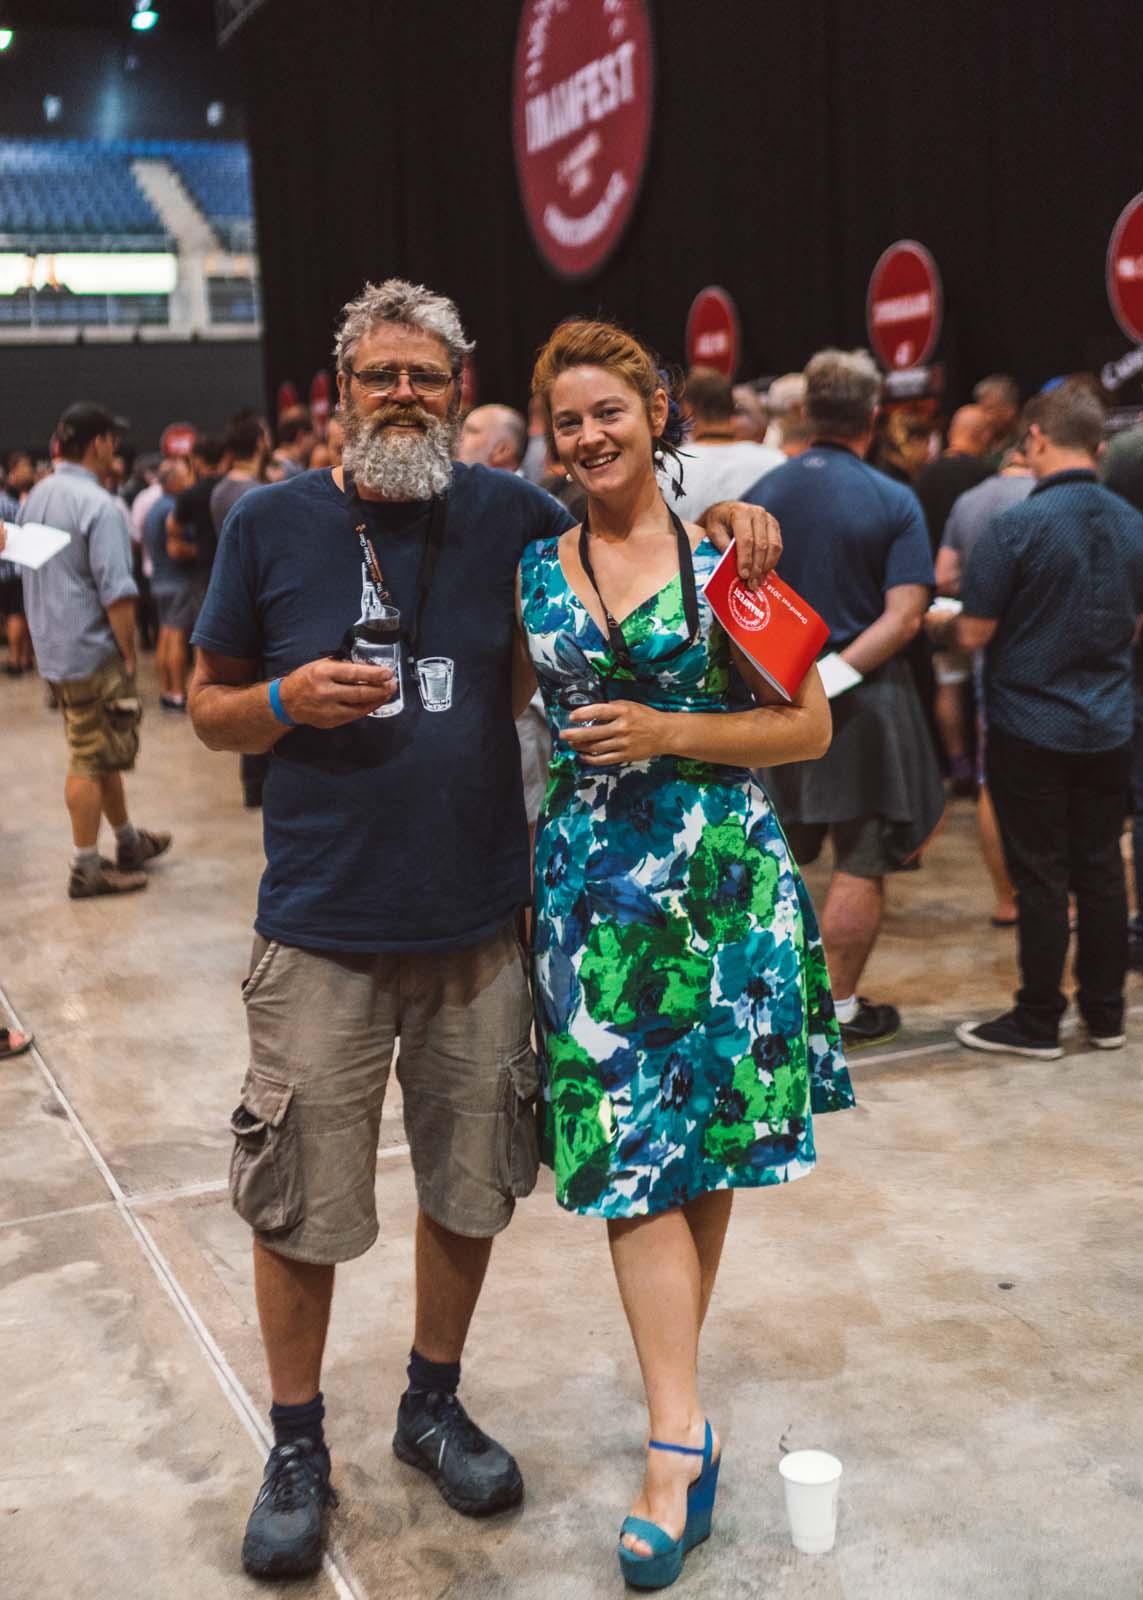 Dramfest 2018 for Whisky Galore-22.jpg